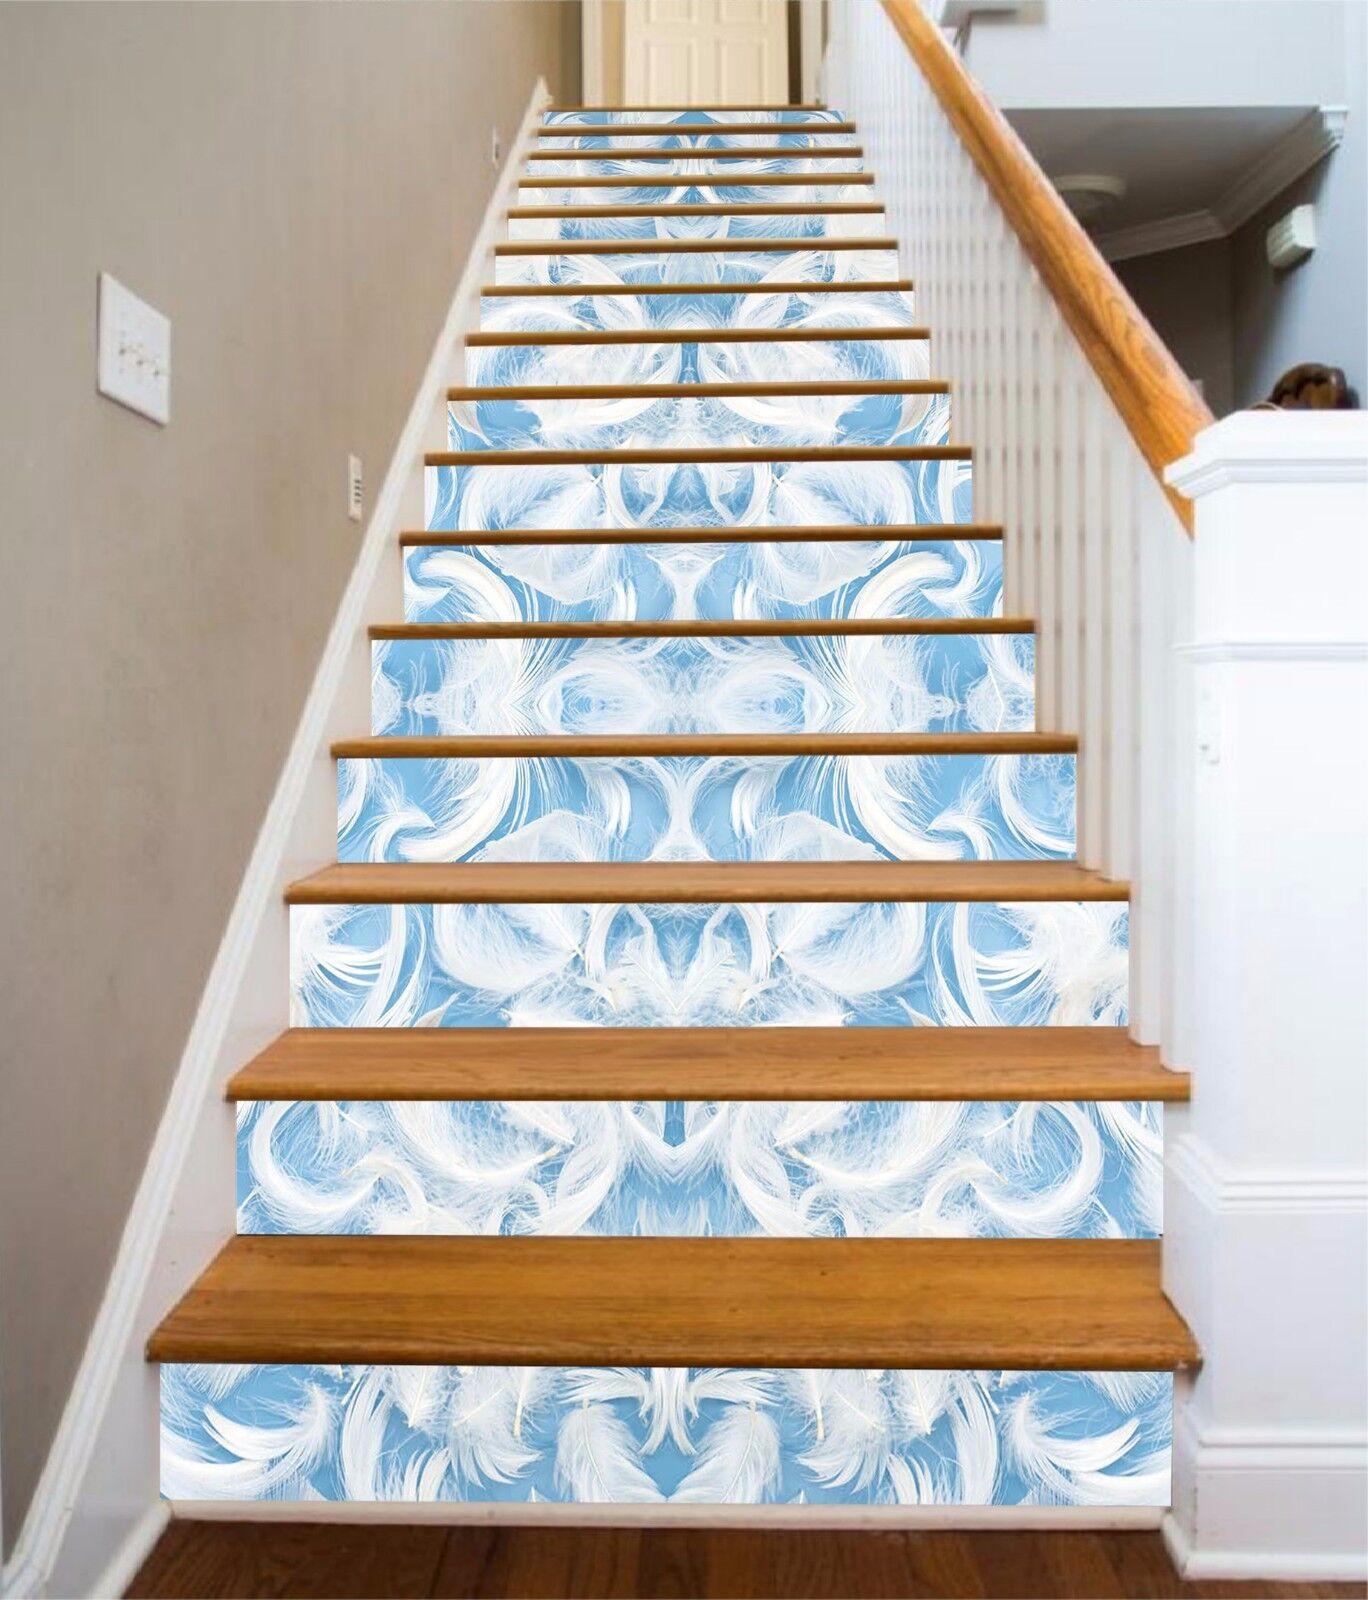 3D Blau texture 57 Stair Risers Decoration Photo Mural Vinyl Decal Wallpaper UK